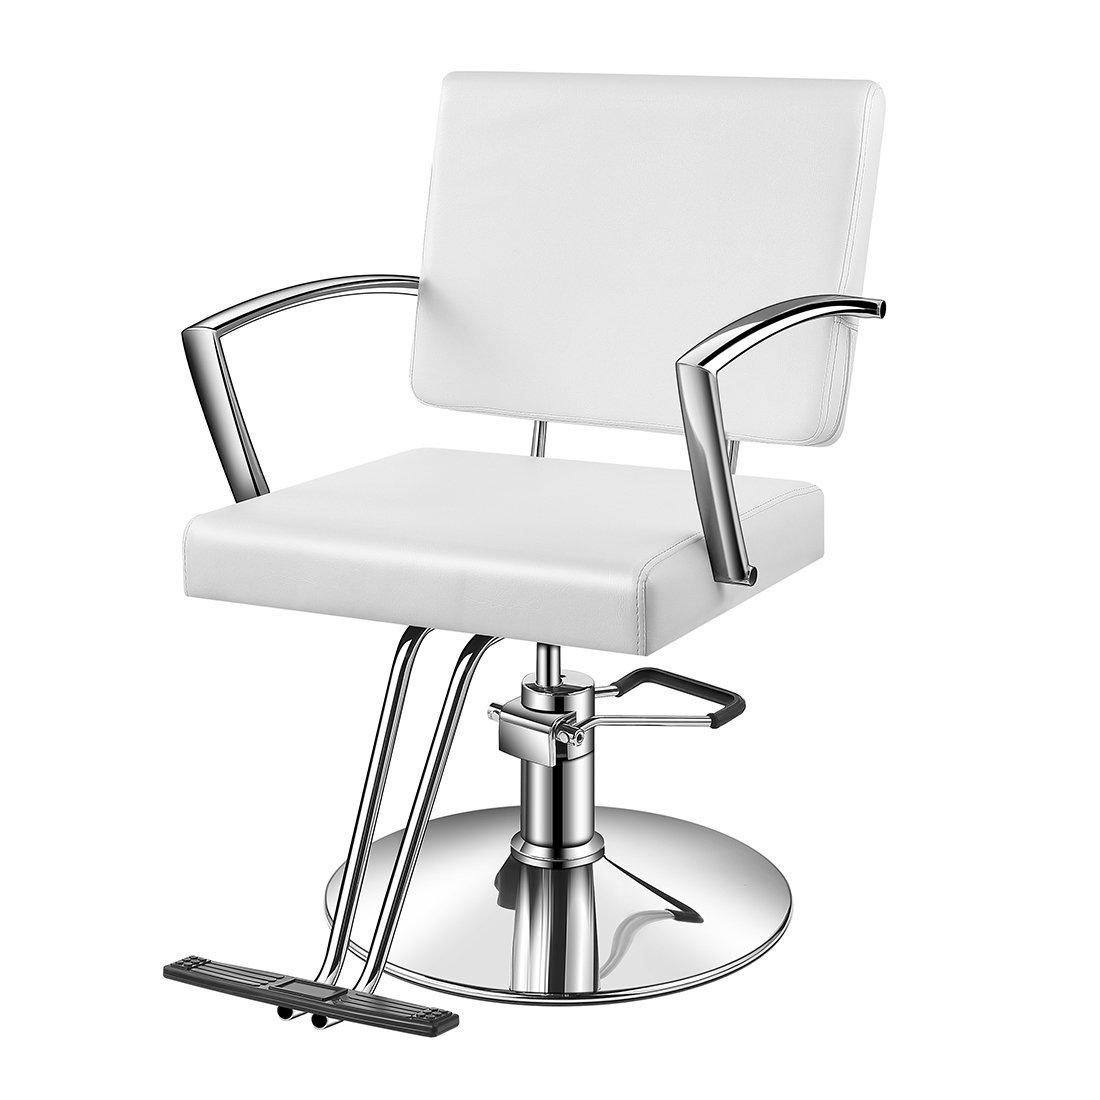 Buy Baasha Hair Salon Chair Red With Hydraulic Pump, Red